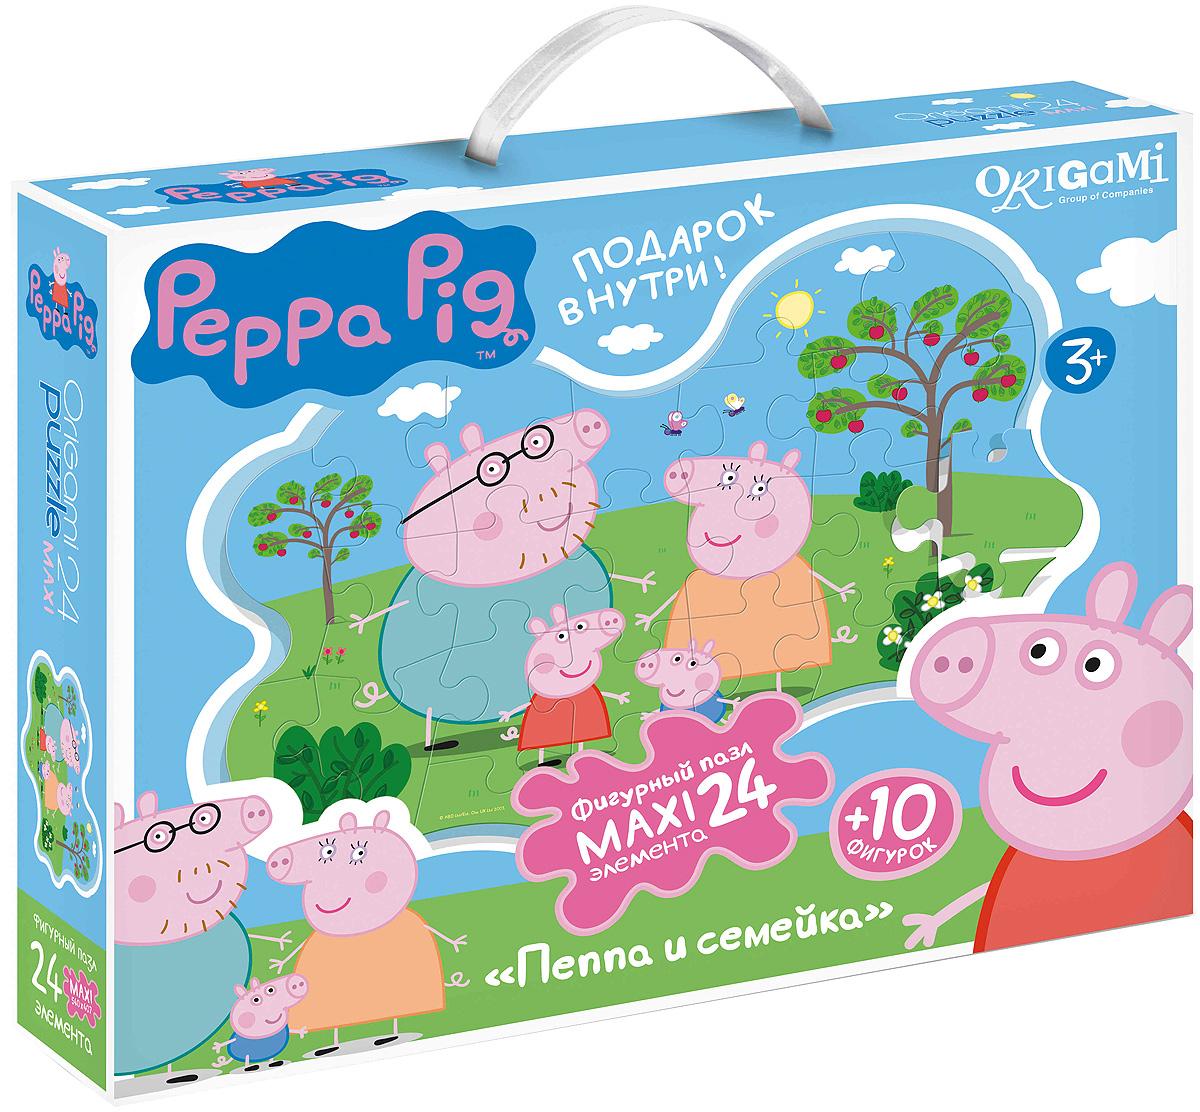 Peppa Pig Пазл для малышей Пеппа и семейка пазлы origami peppa pig пазл 24 элемента